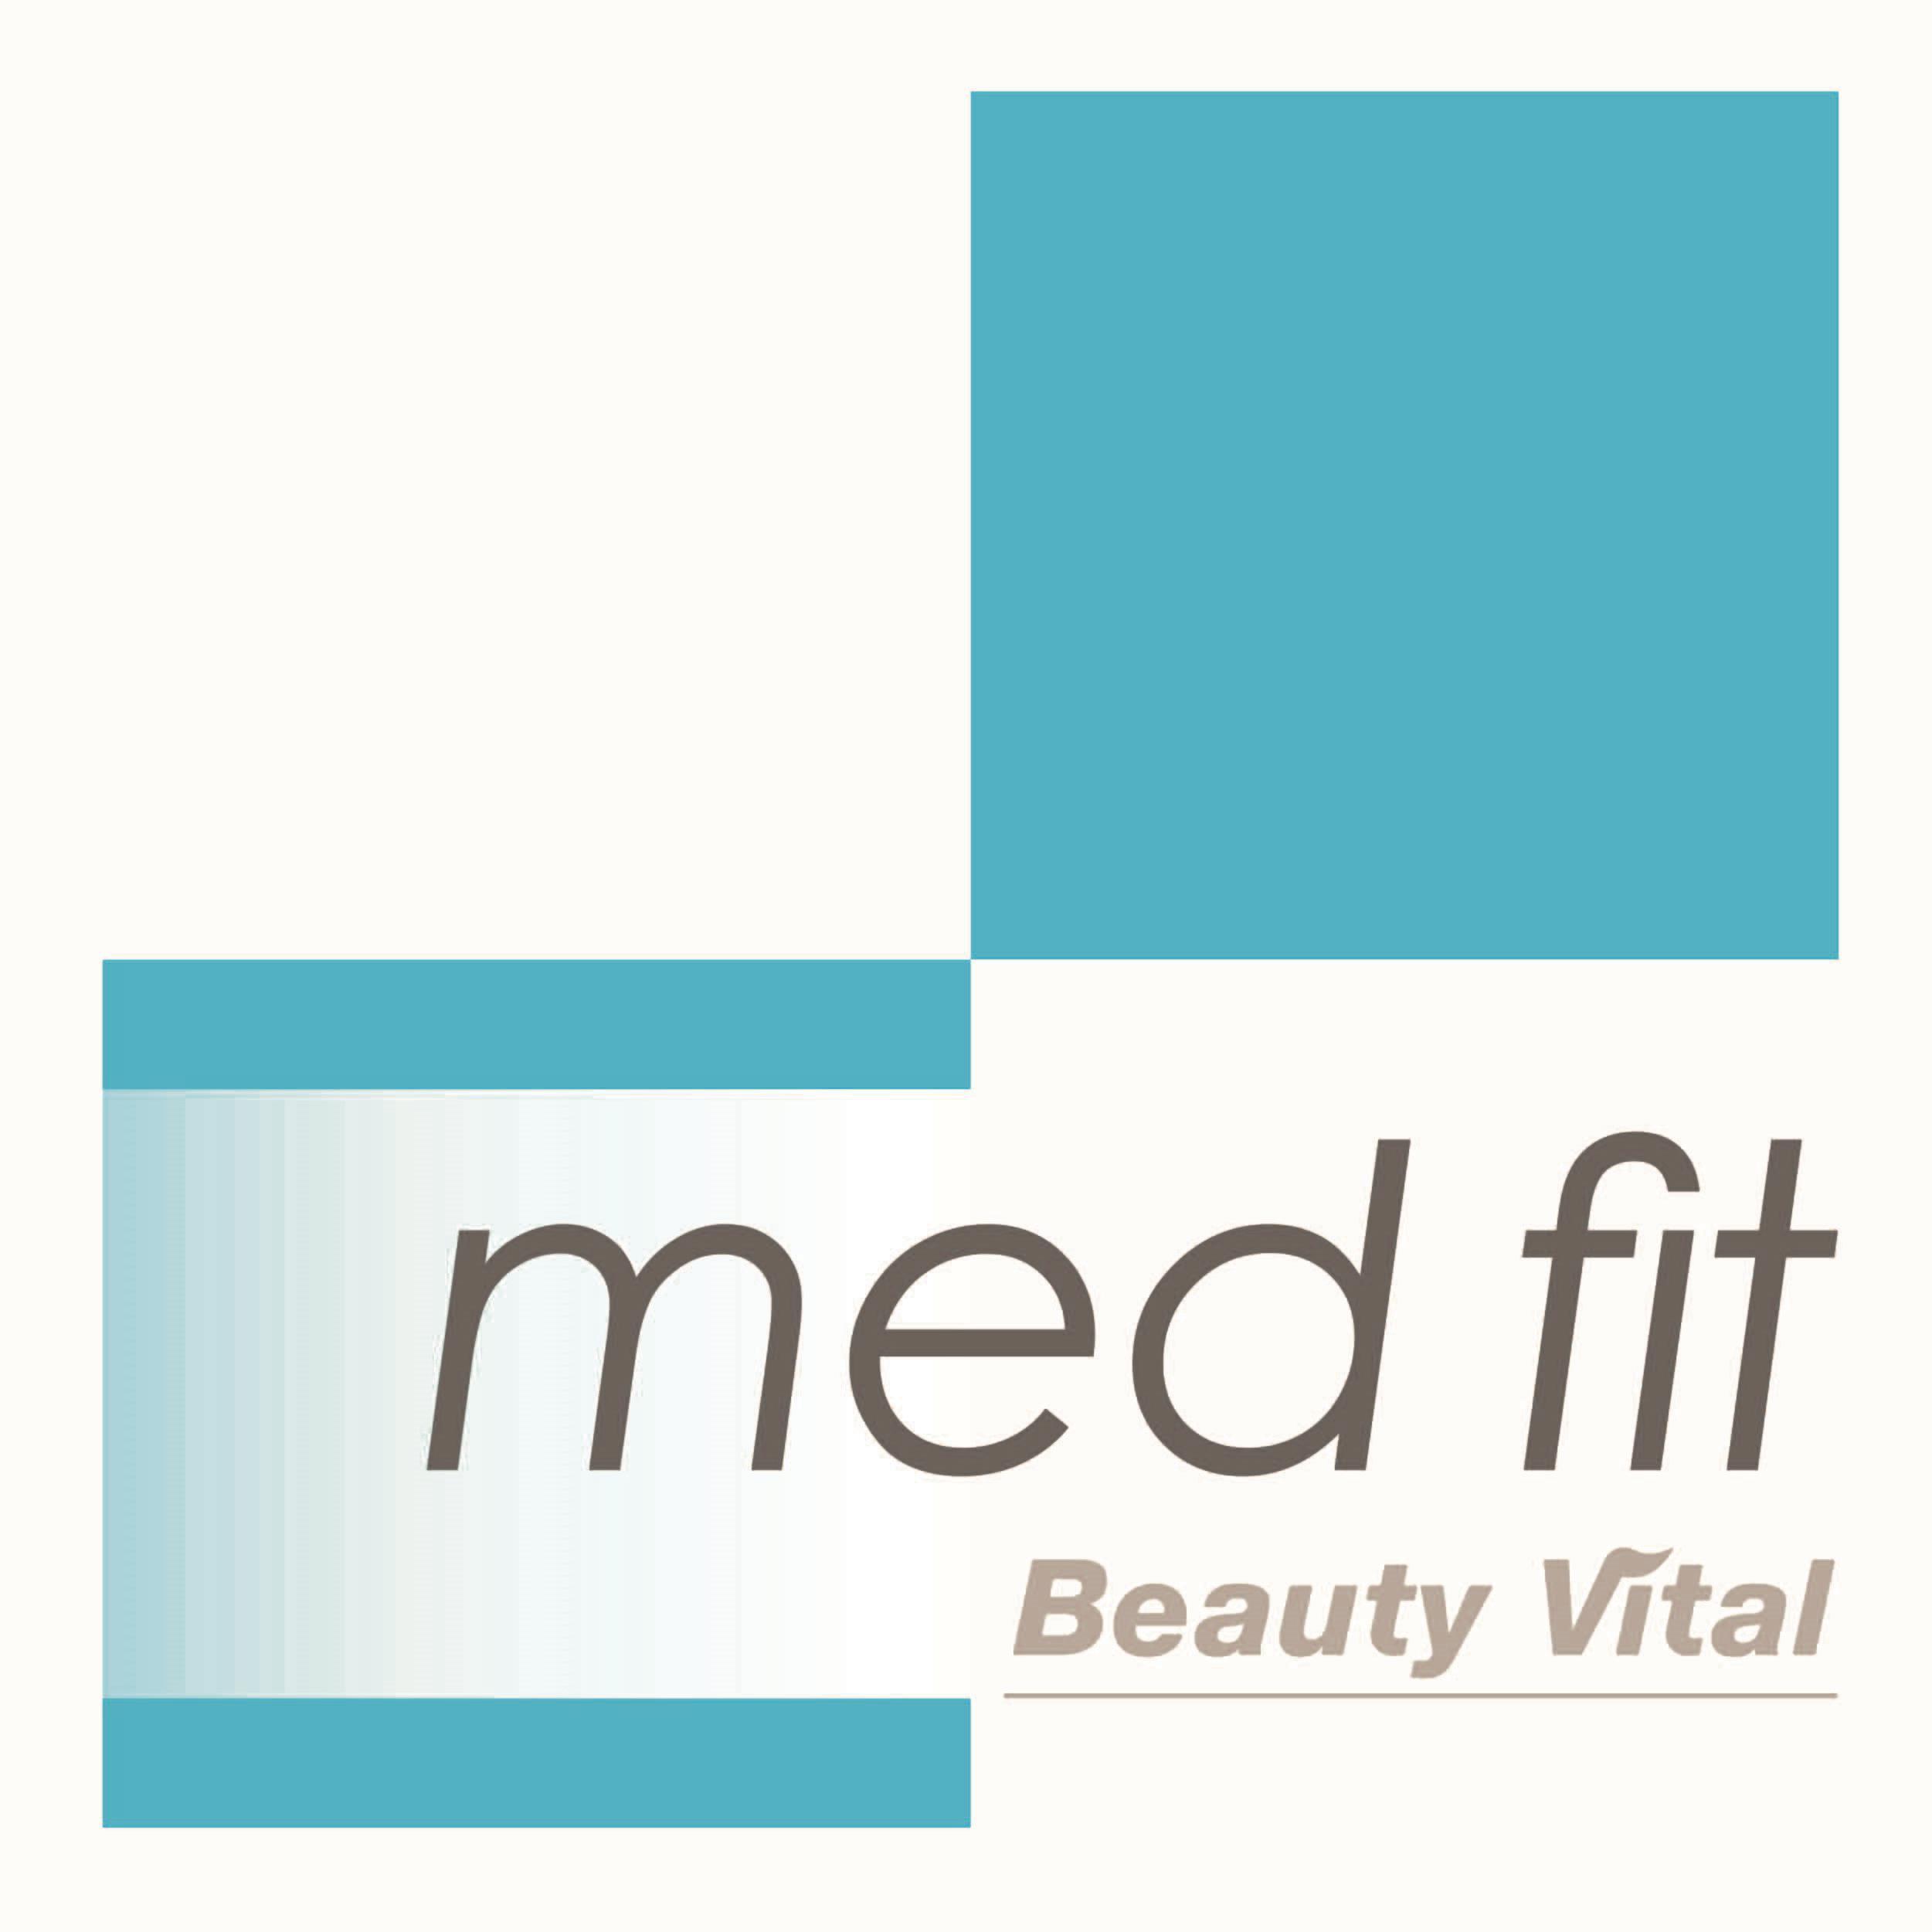 medfit Beauty Vital